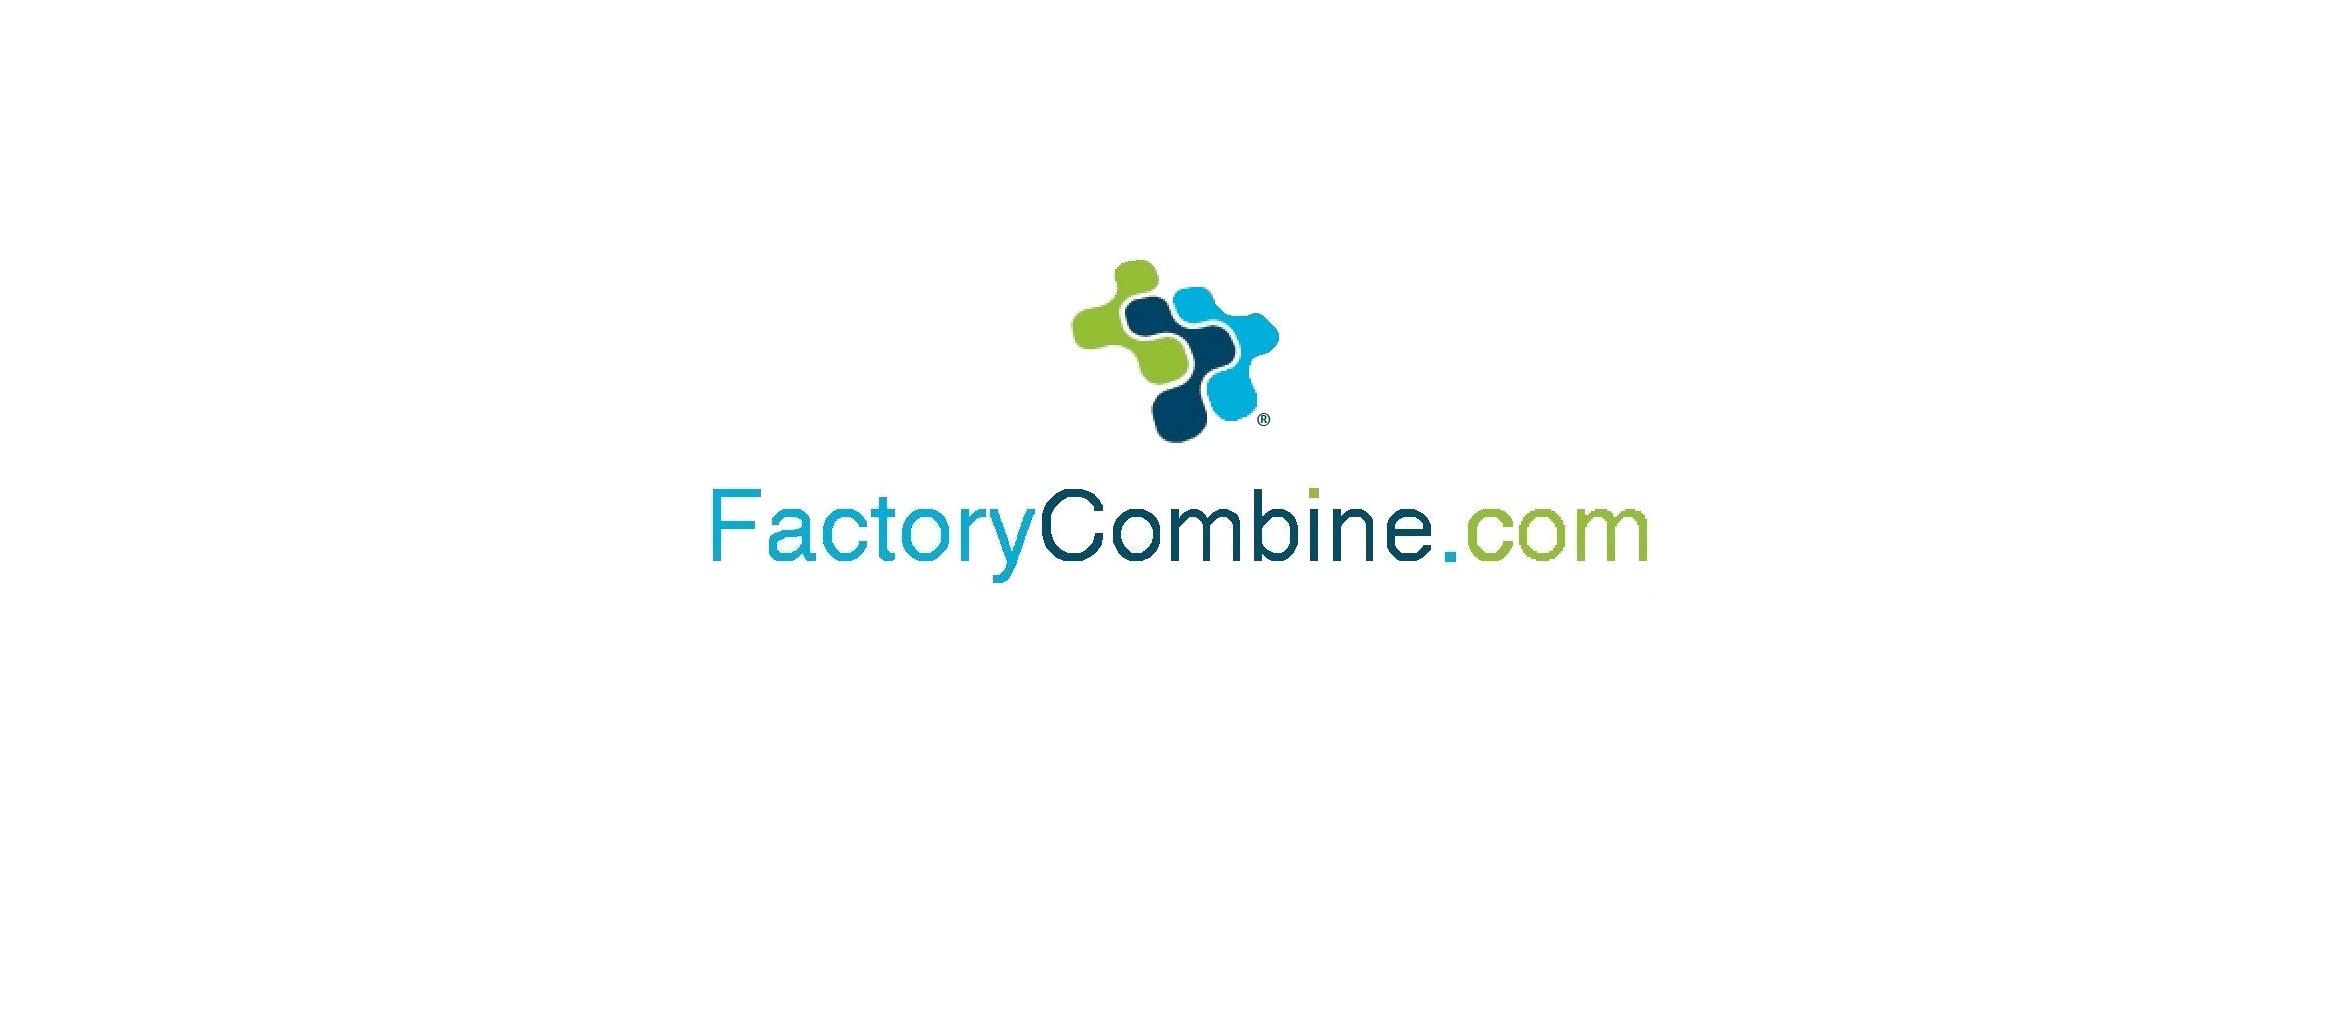 FactoryCombine Commerce Services